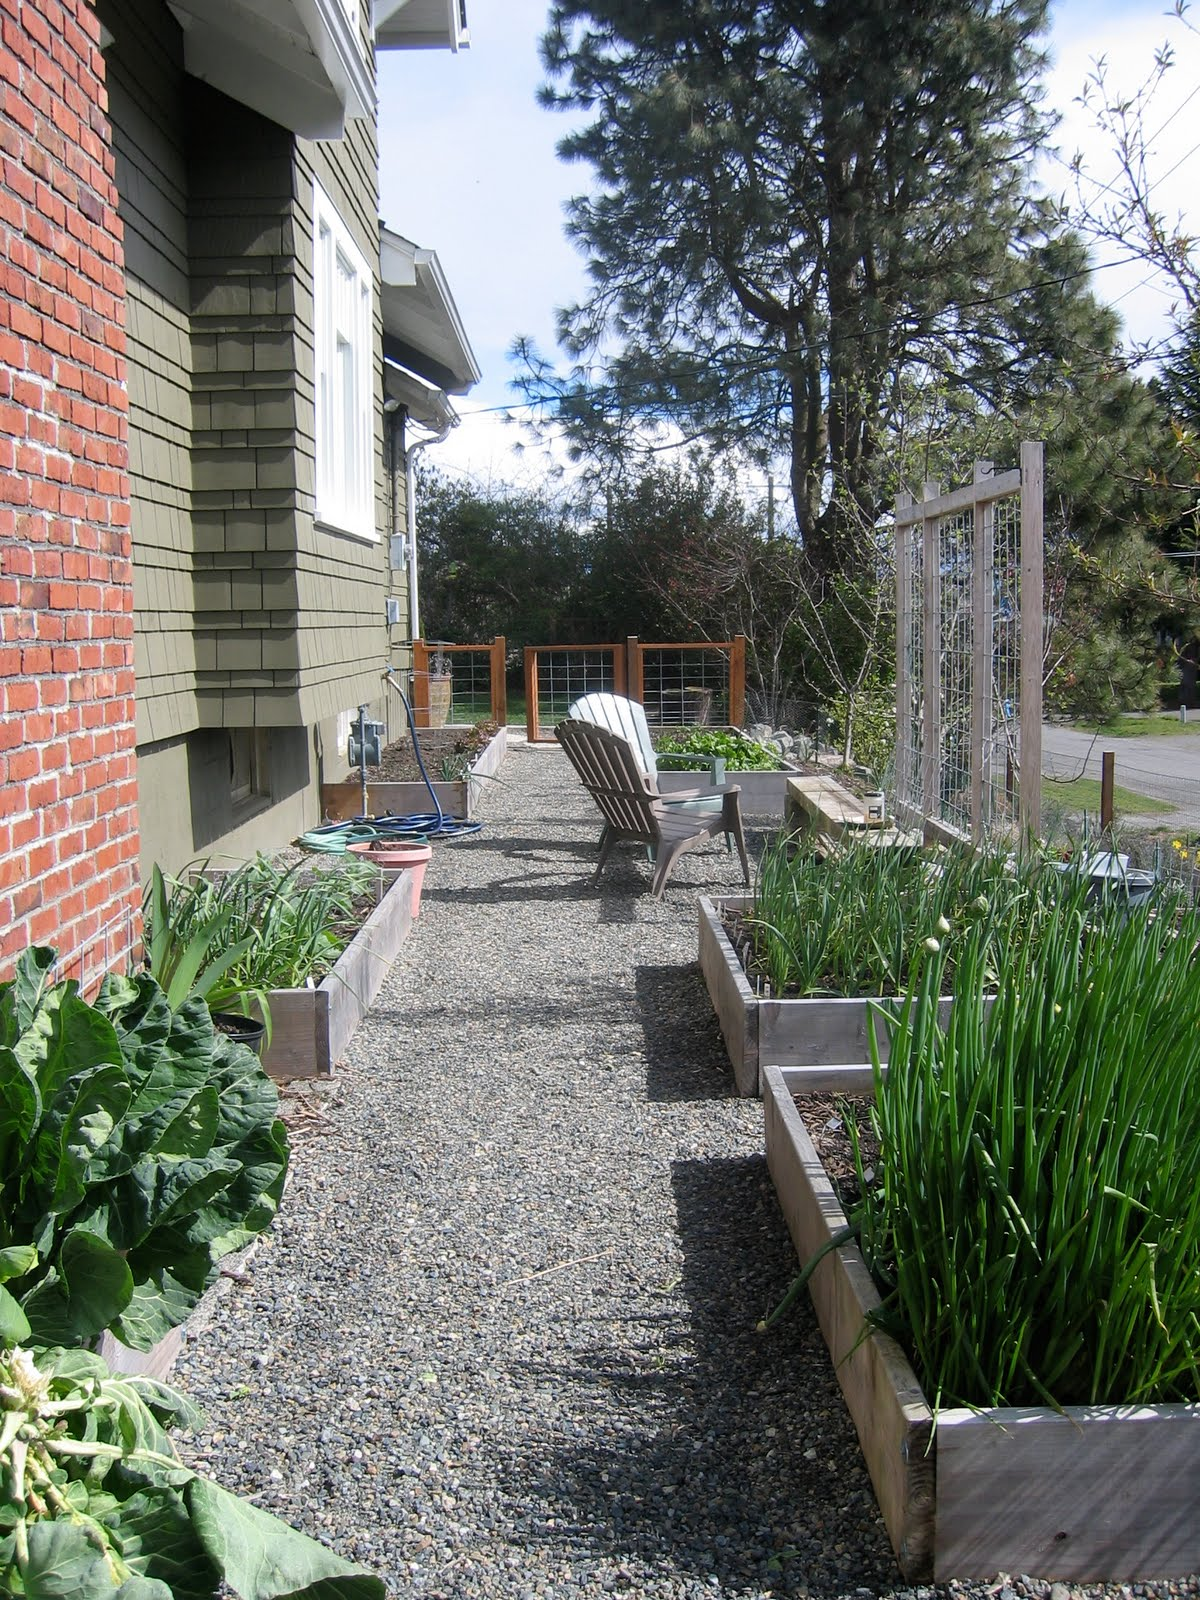 Our Kitchen Garden The Tacoma Kitchen Garden Journal Our Kitchen Garden An Early